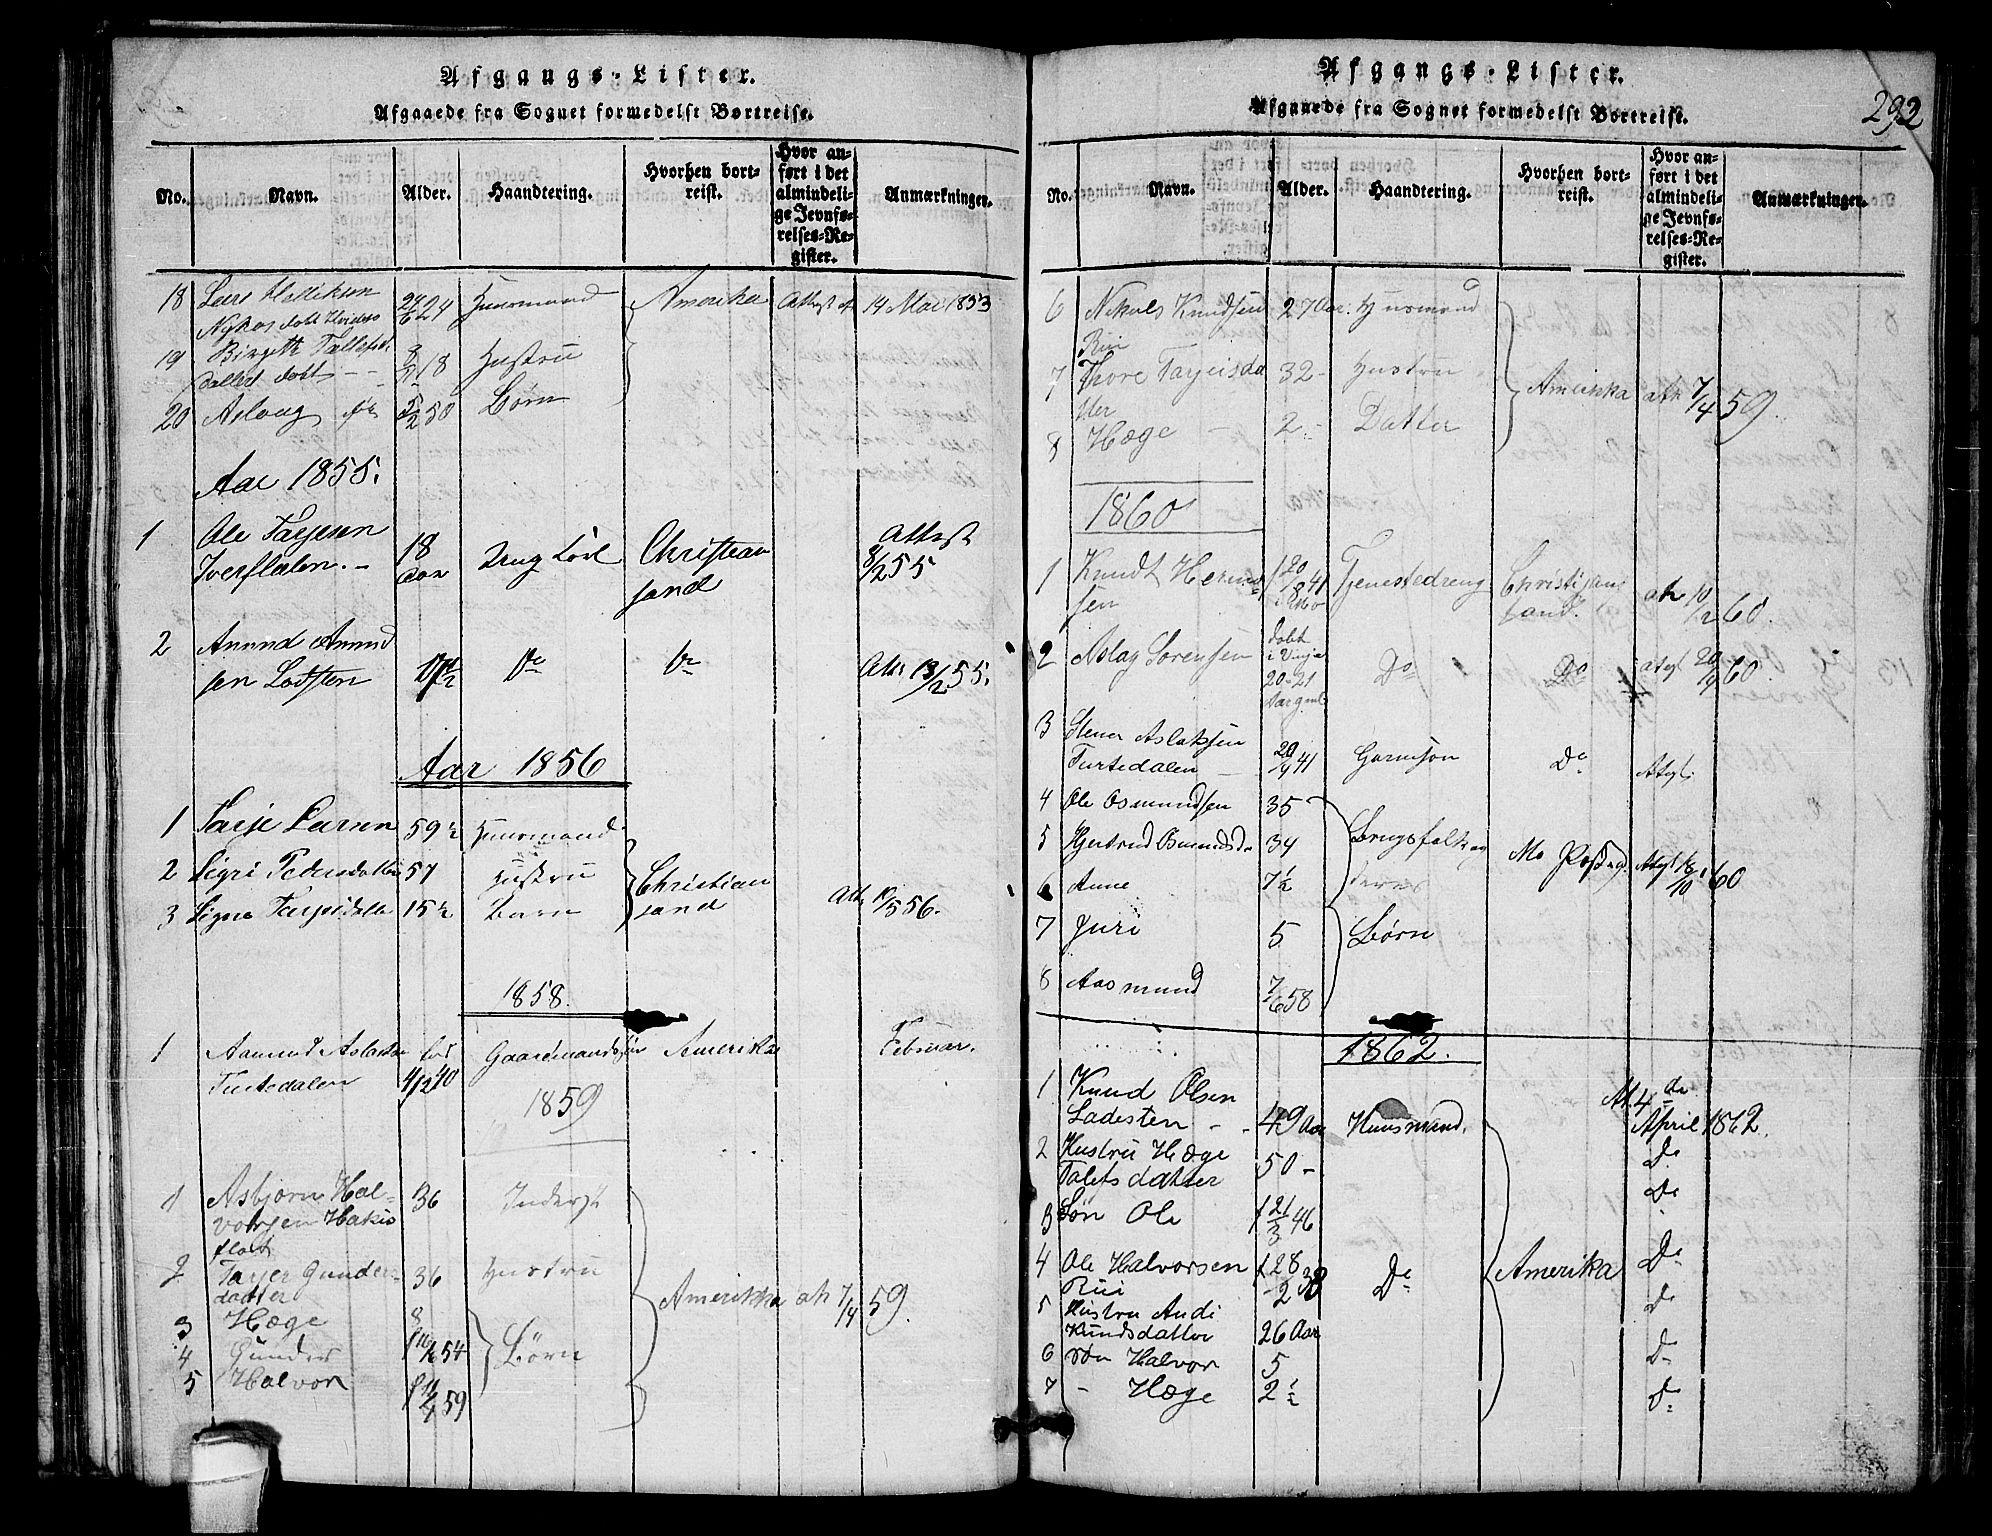 SAKO, Lårdal kirkebøker, G/Gb/L0001: Klokkerbok nr. II 1, 1815-1865, s. 292